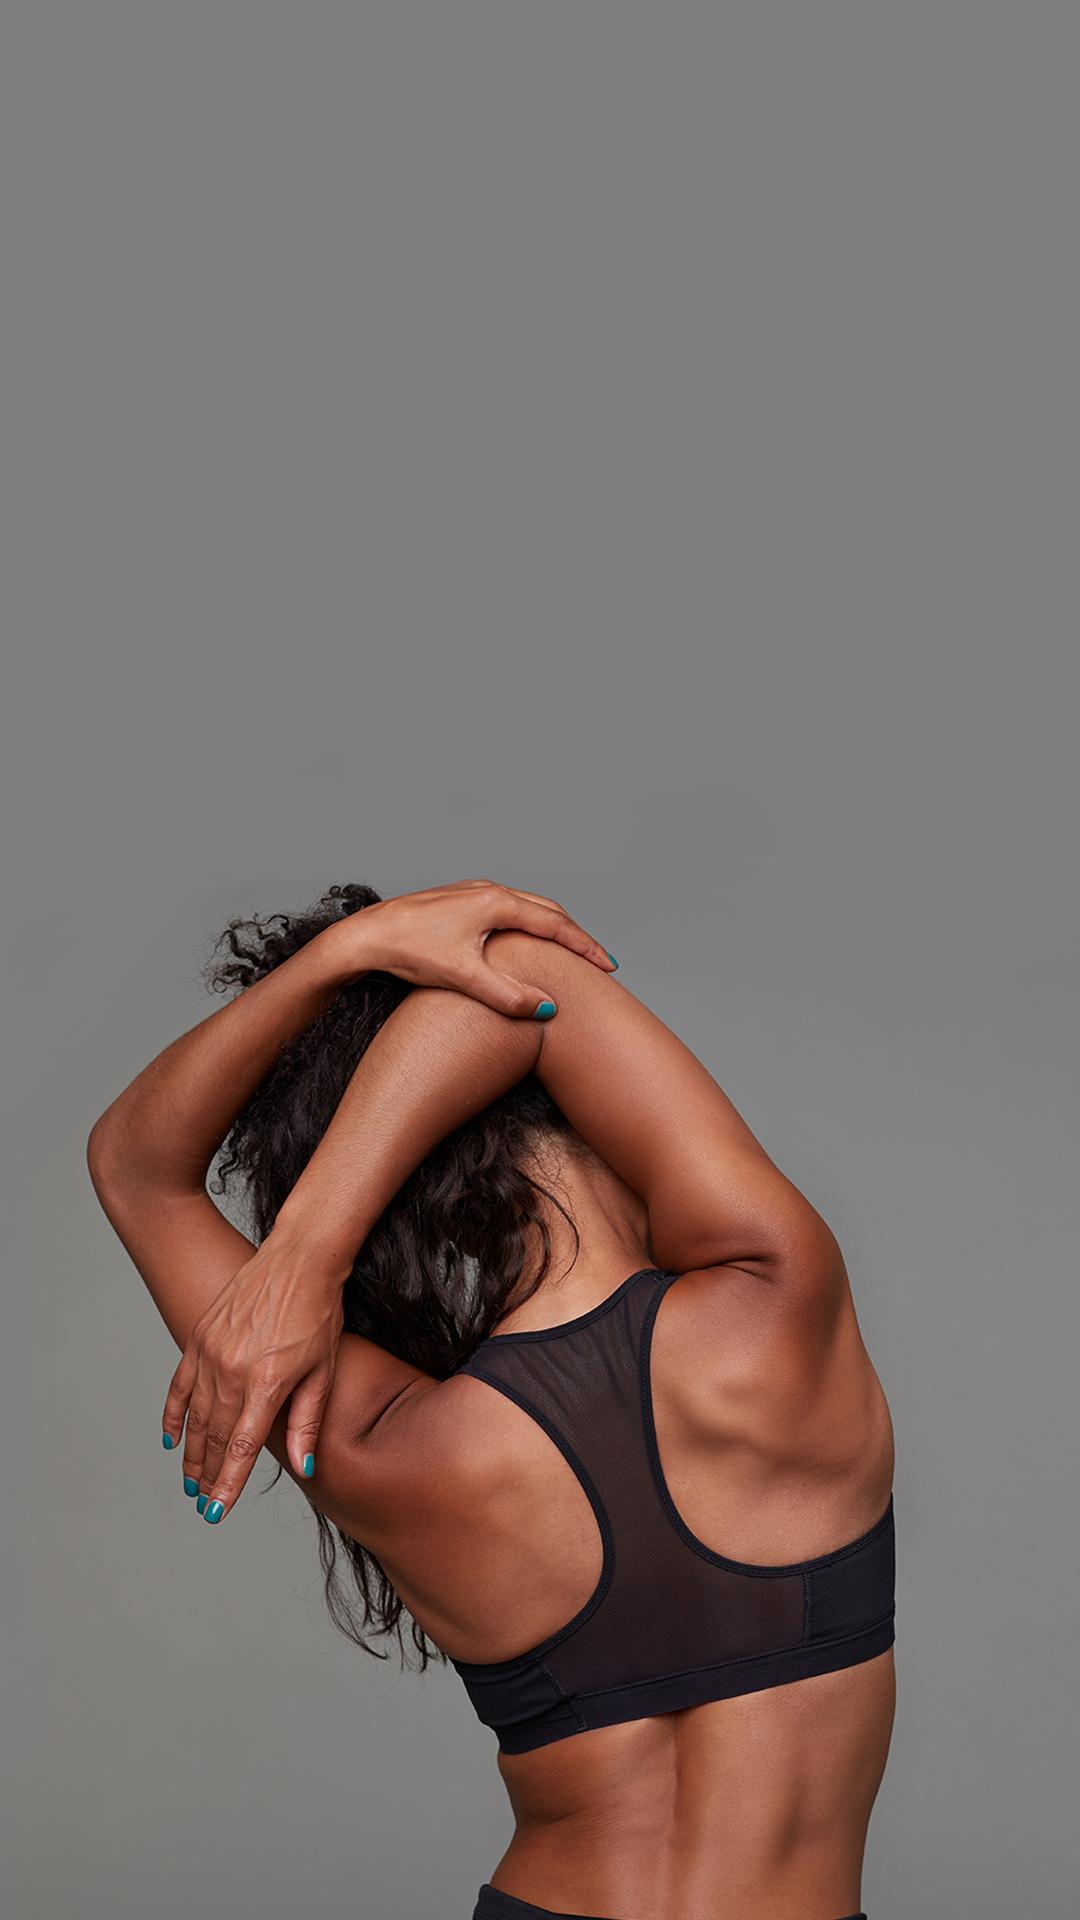 5 Easy Stretches to Enhance Flexibility